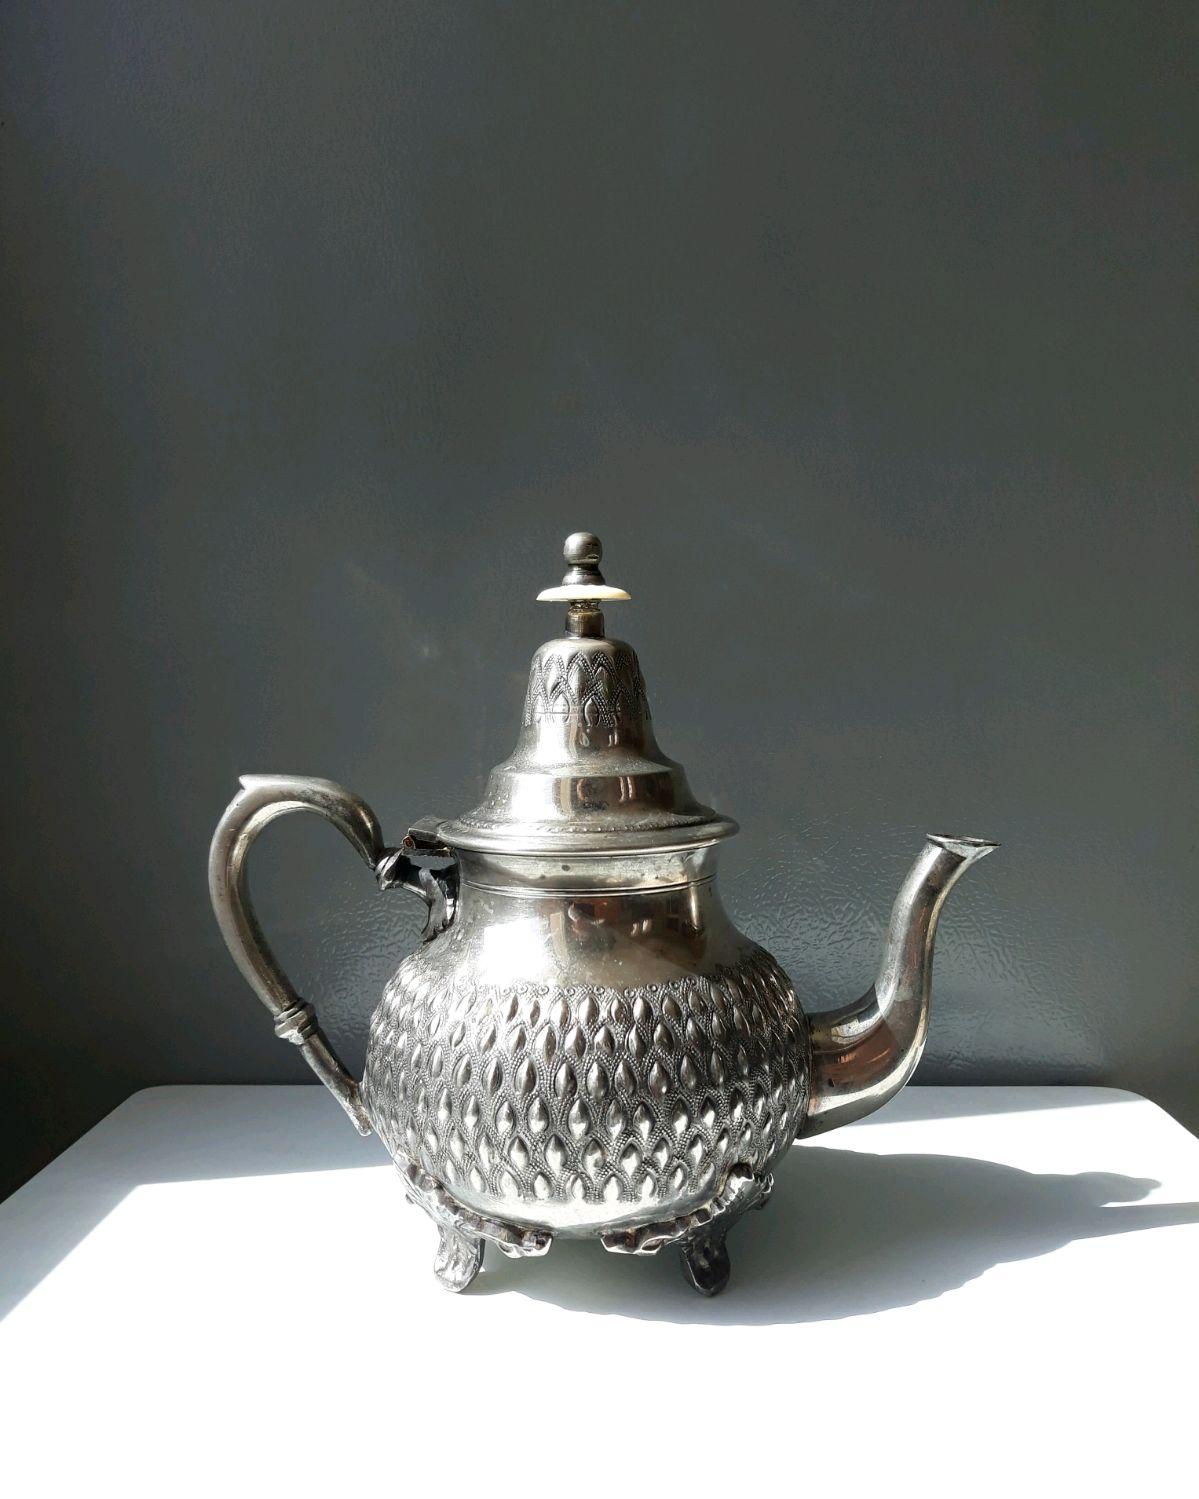 Morocco, Vintage teapots, Albi,  Фото №1